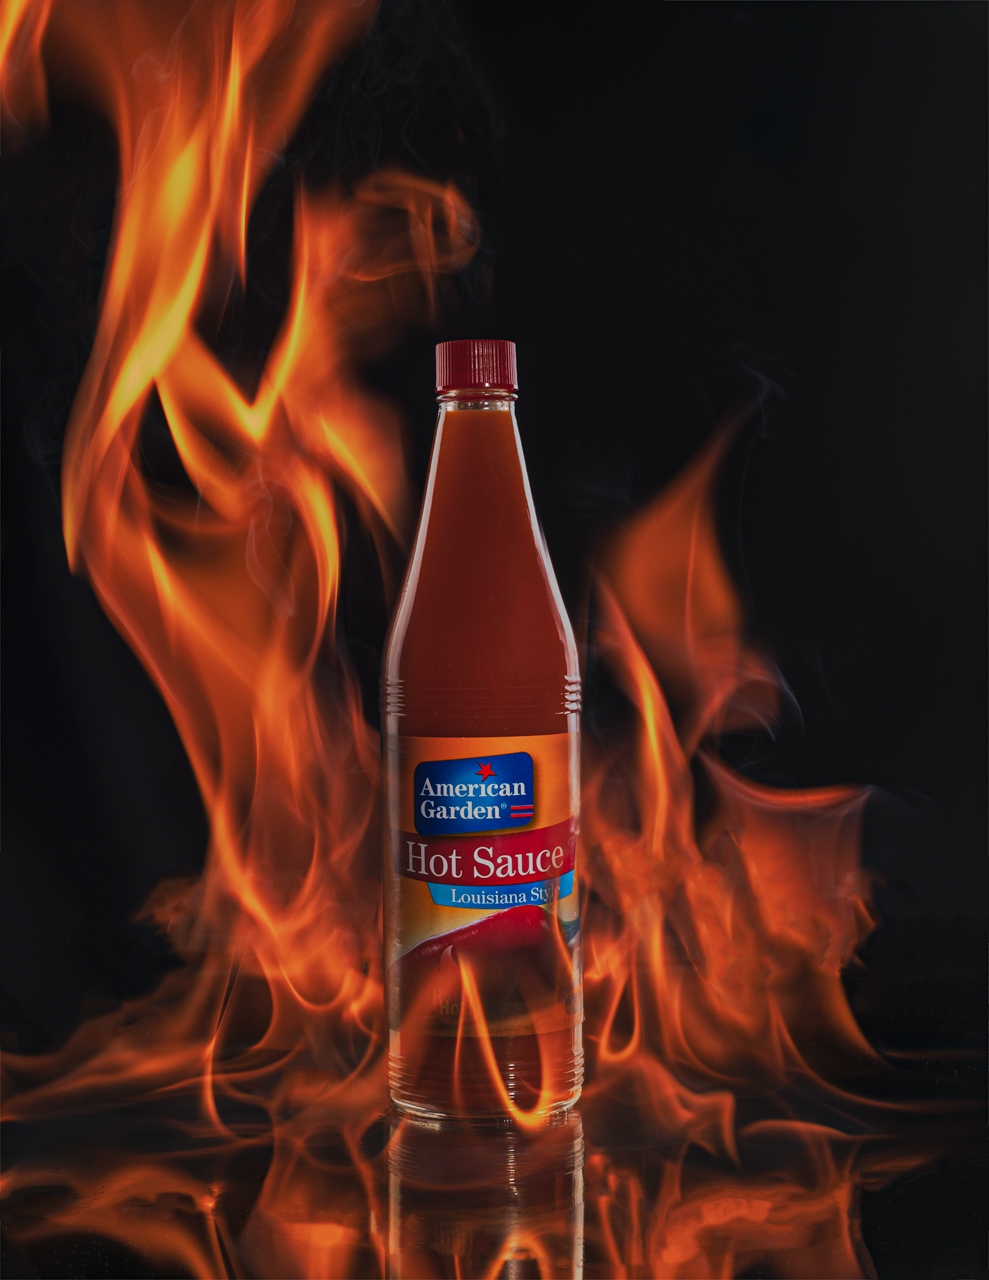 American Garden Hot Sauce